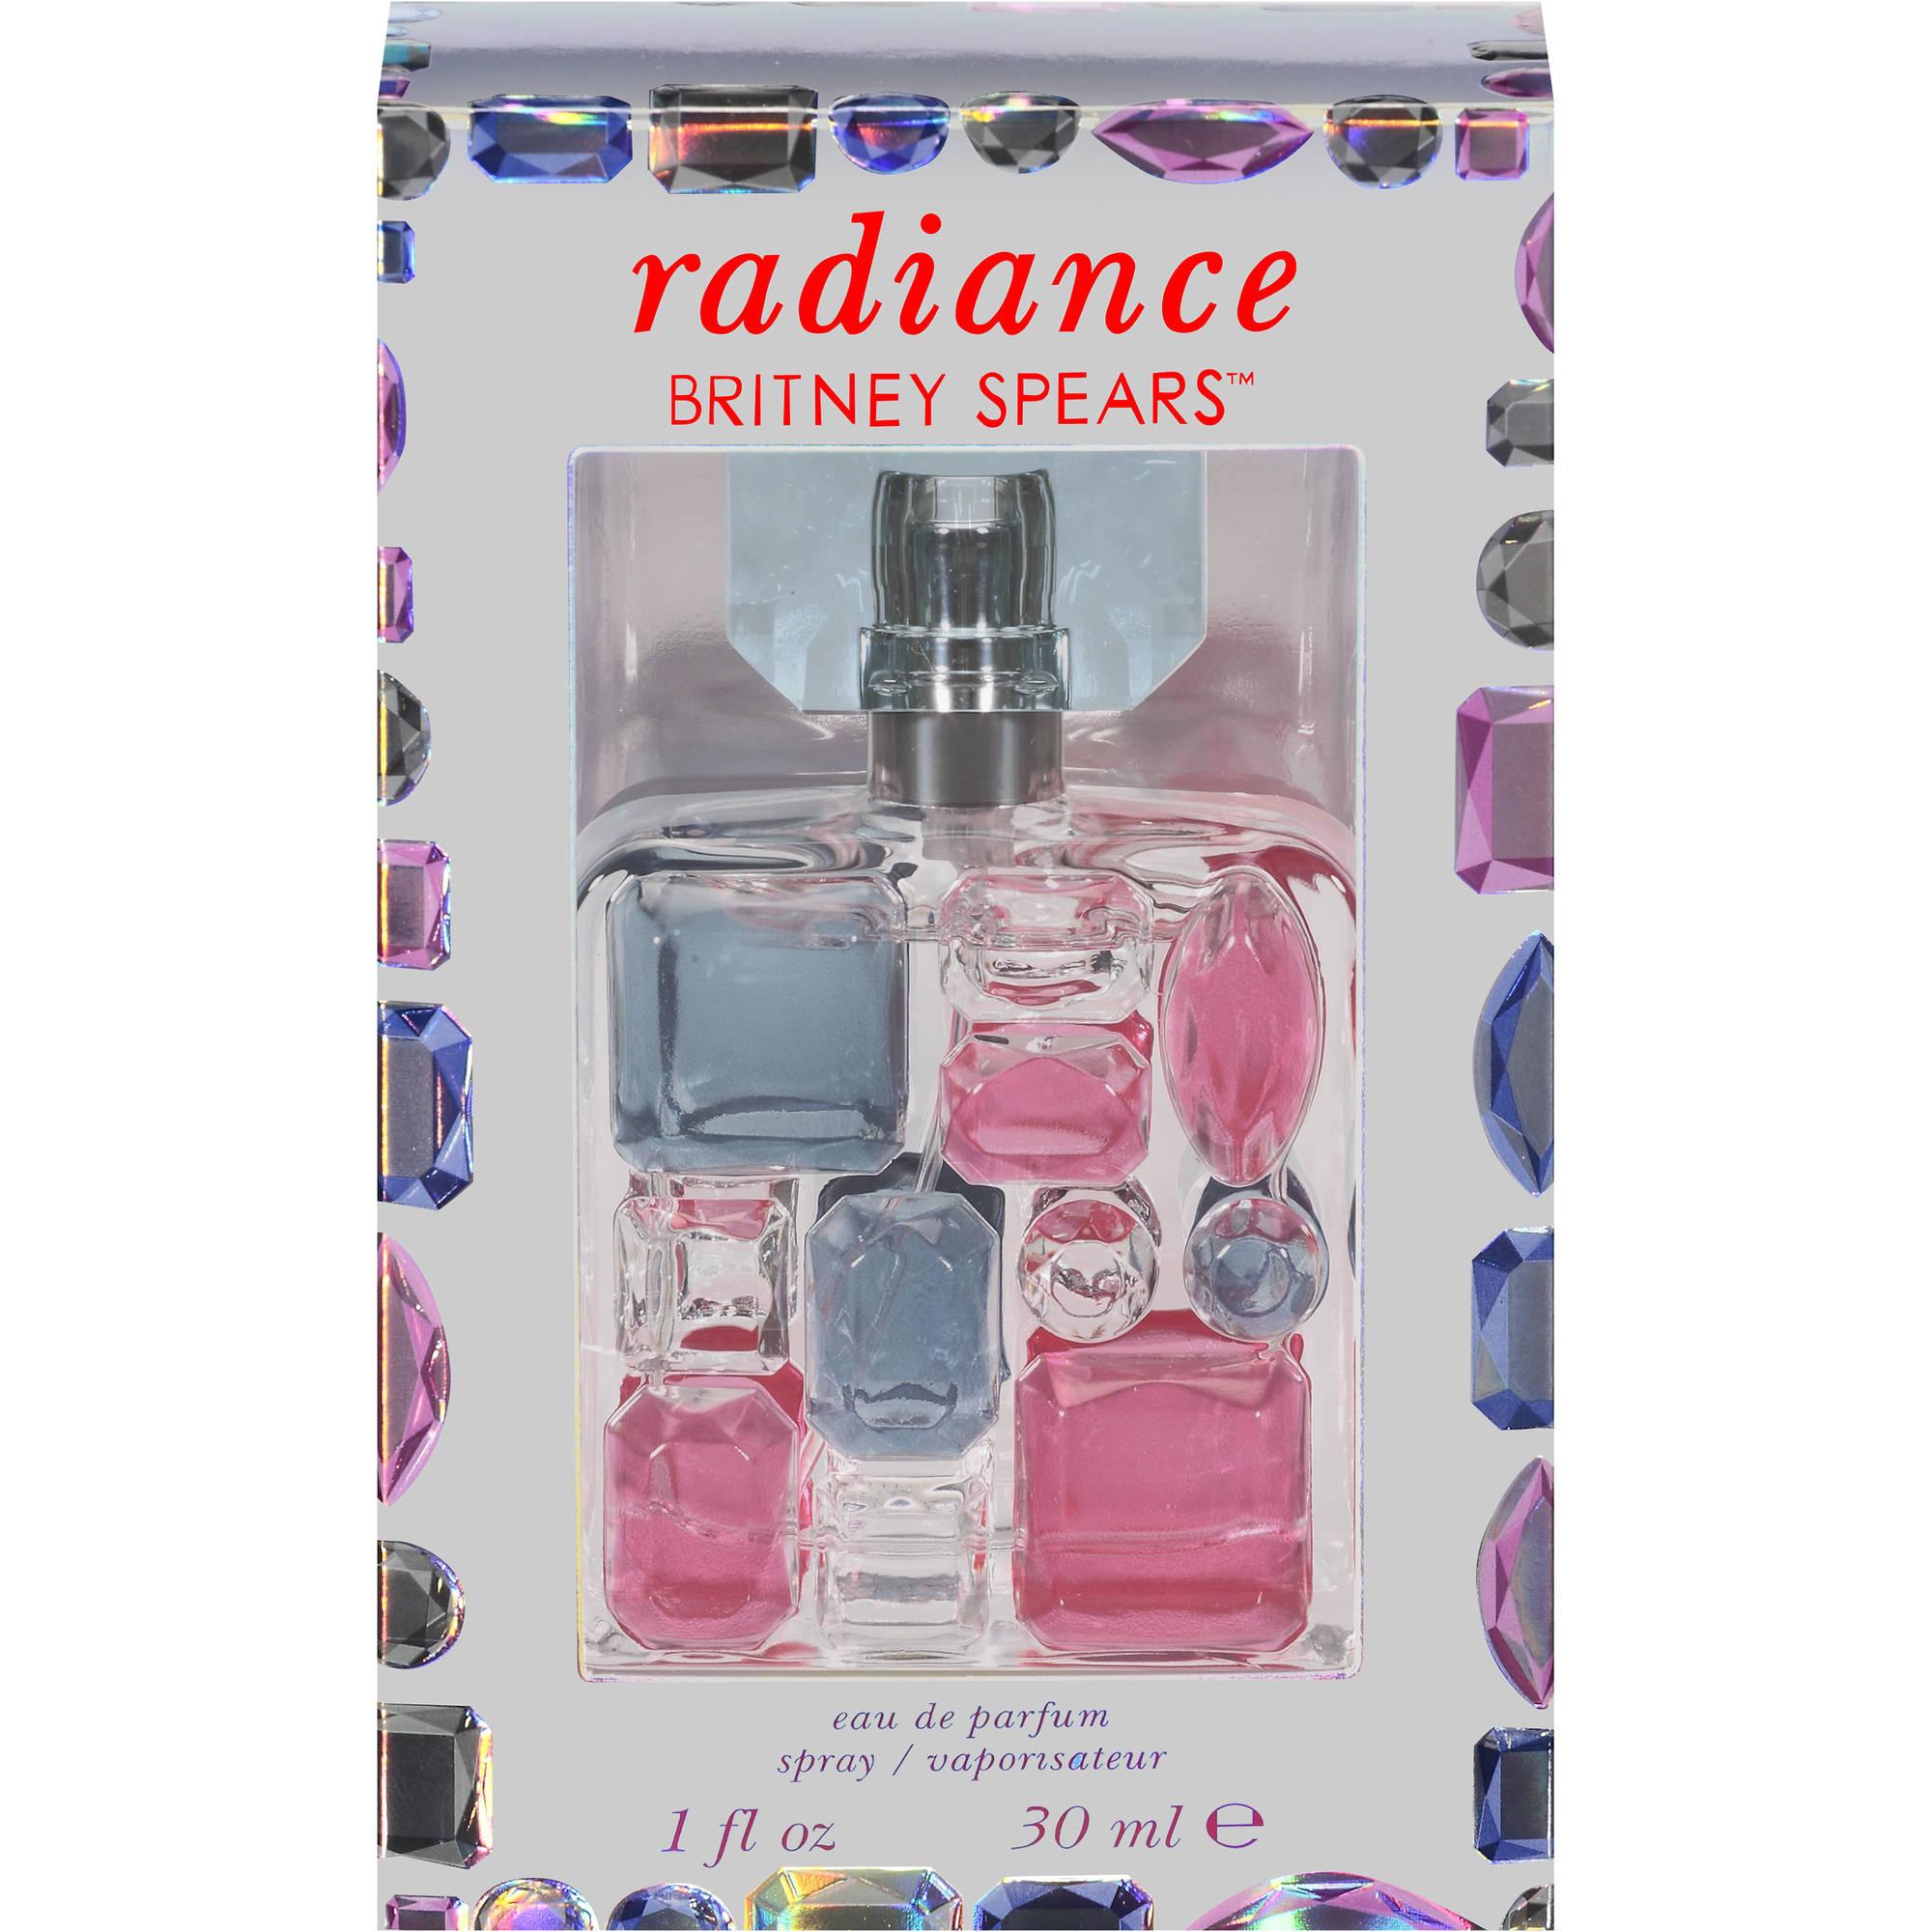 Britney Spears Radiance Eau de Parfum Spray, 1 fl oz